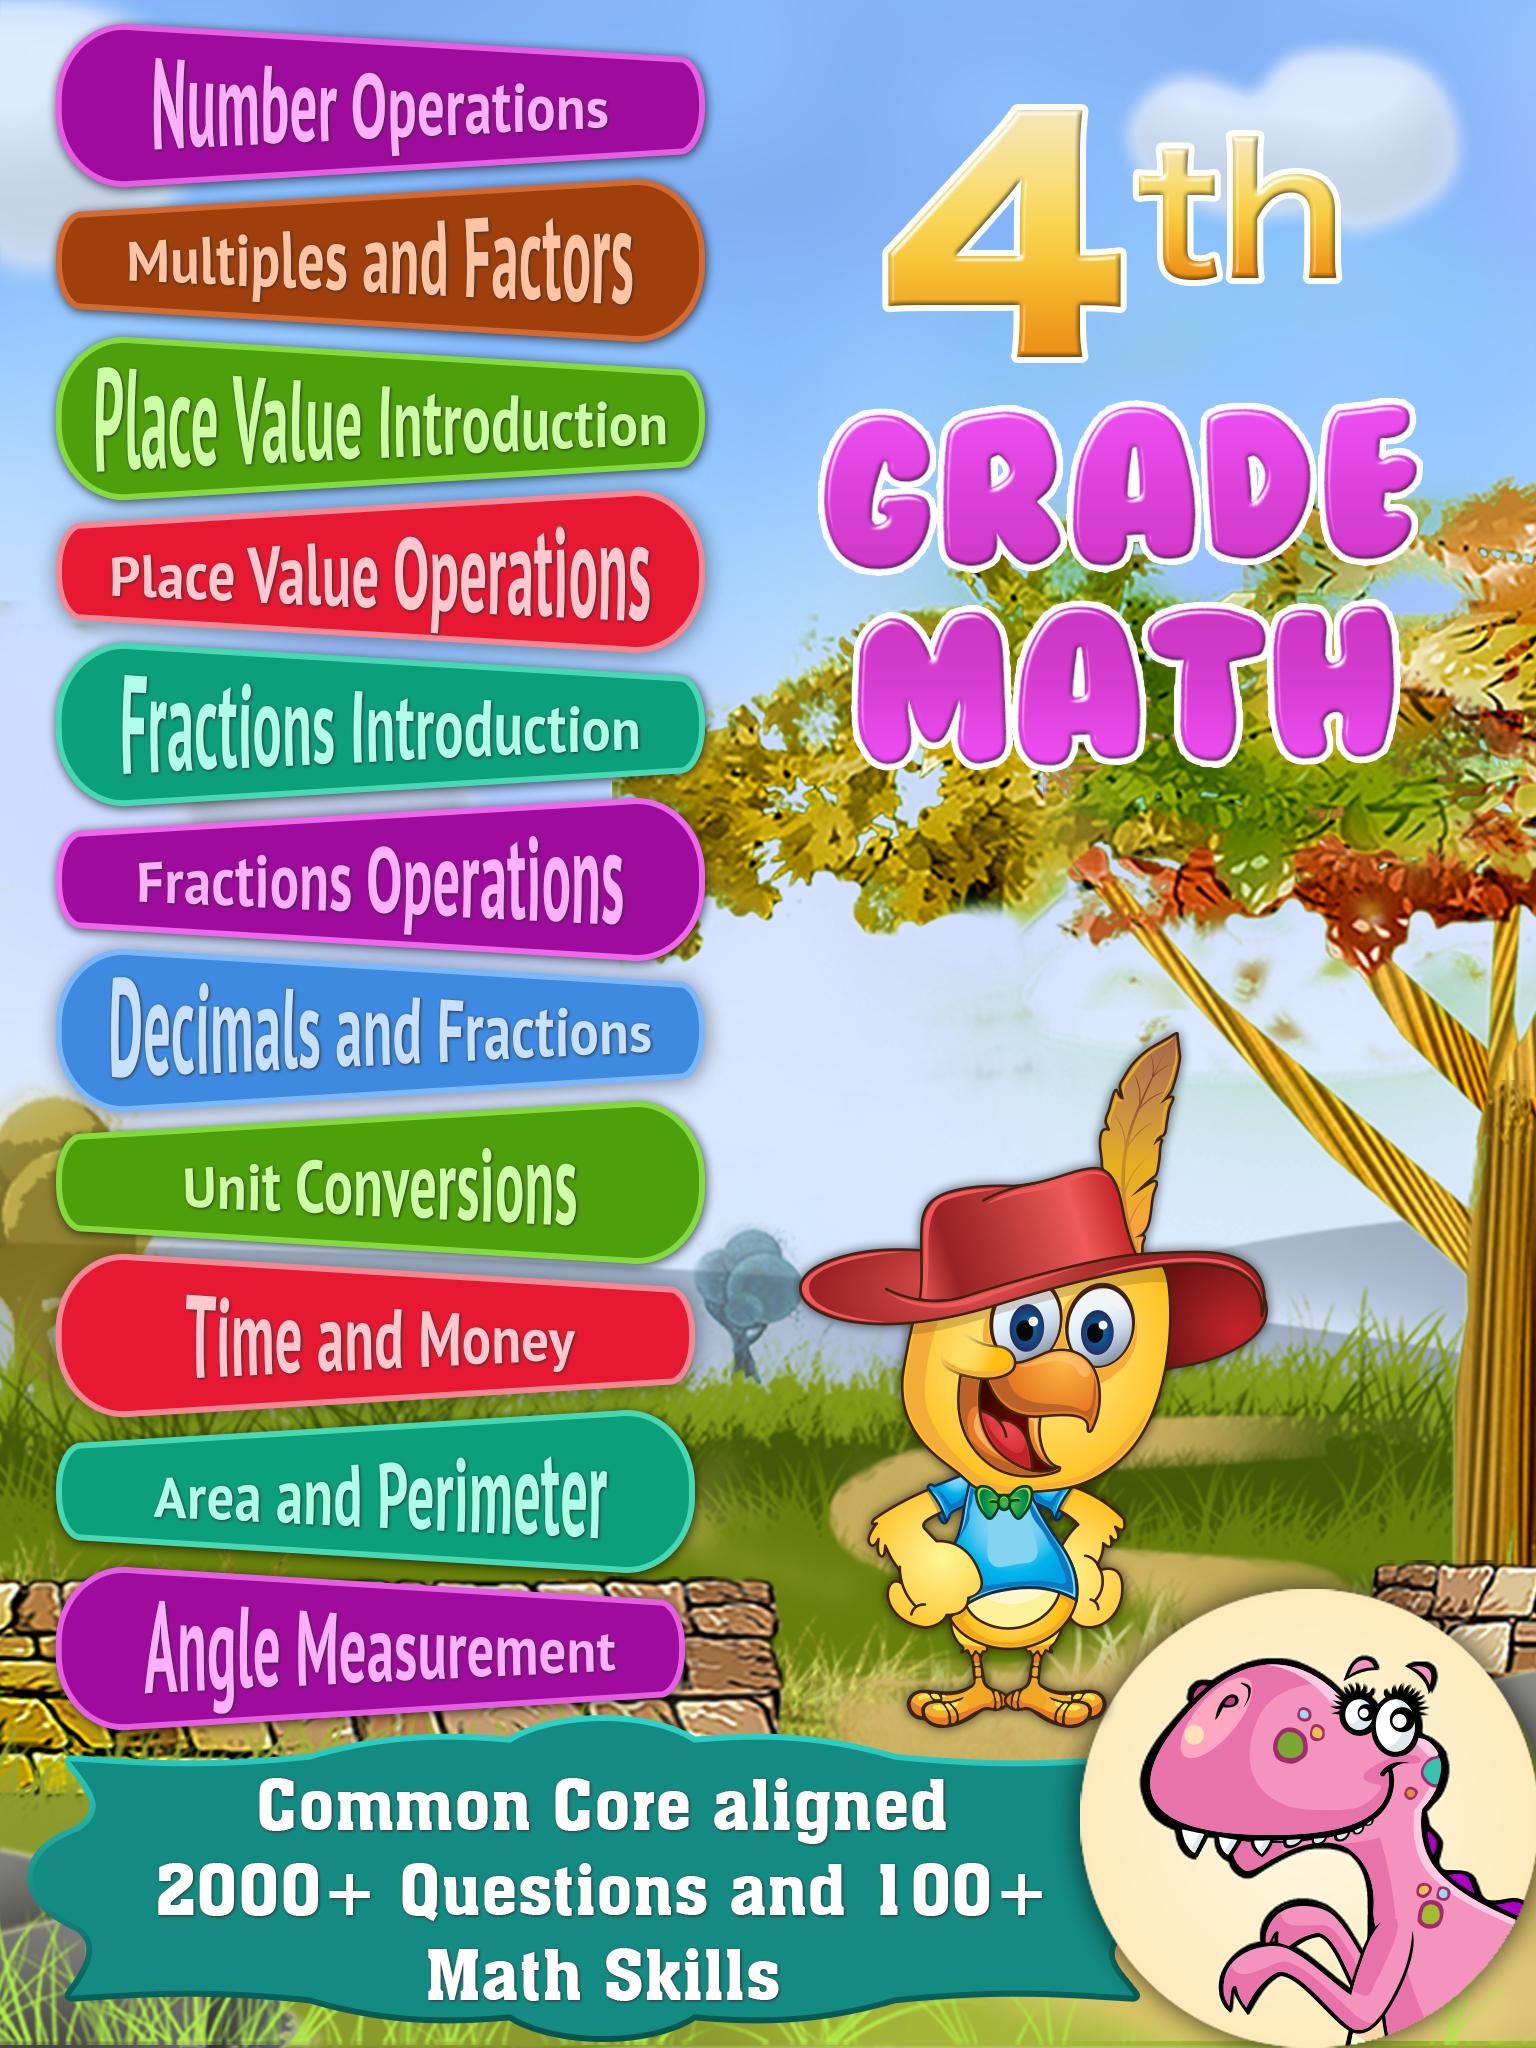 Amazing app for 4th Grade math. Best math apps